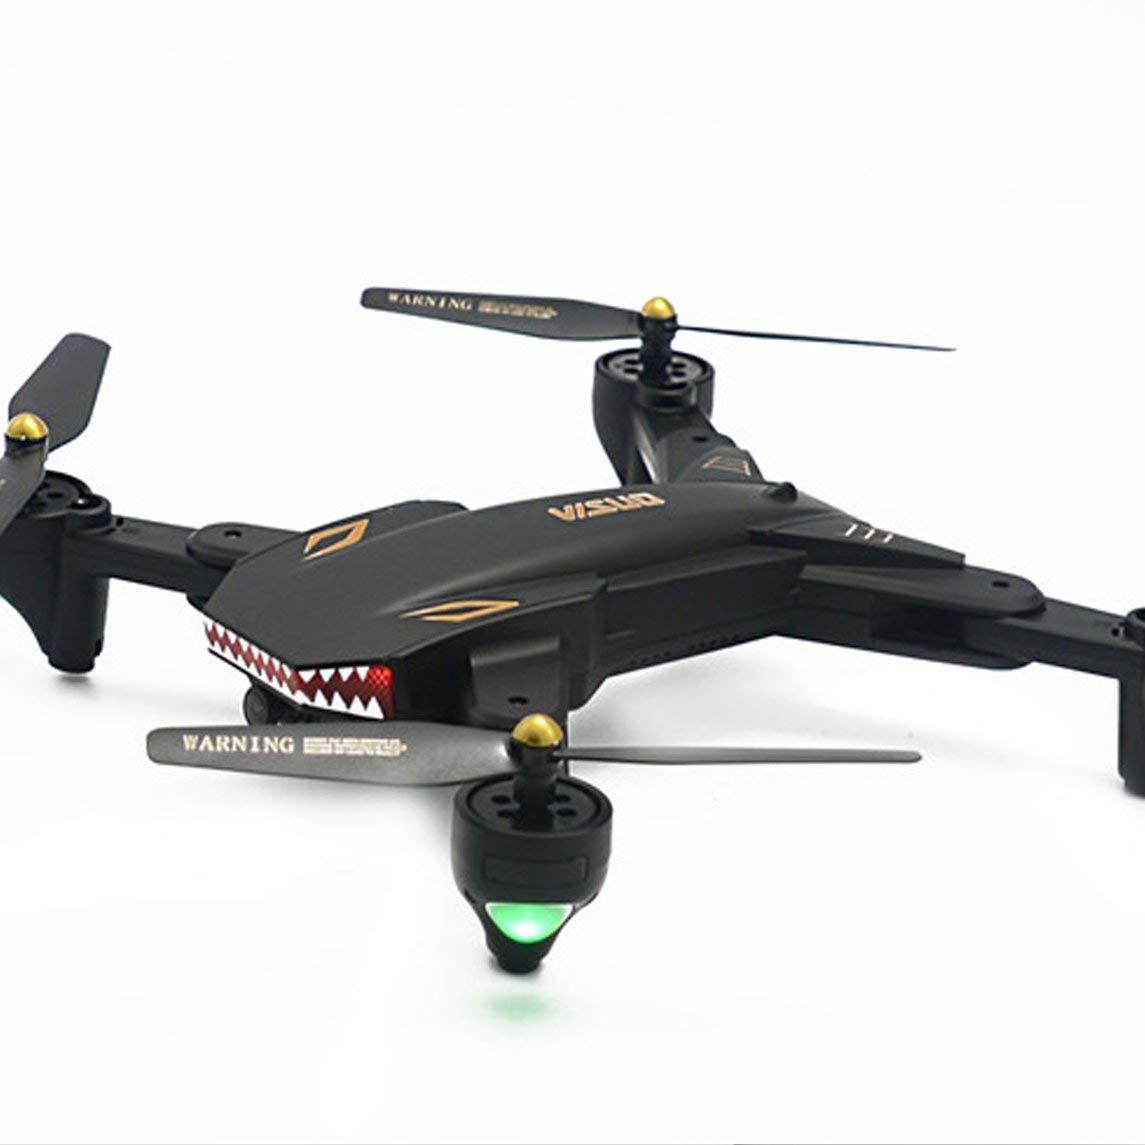 Footprintse XS809S RC Drohne mit 720 P Weitwinkel Weitwinkel Weitwinkel Kamera Faltbare Quadrocopter Headless Modus Höhe Halten G-Sensor WiFi FPV Drone-Farbe:schwarz 2f8997